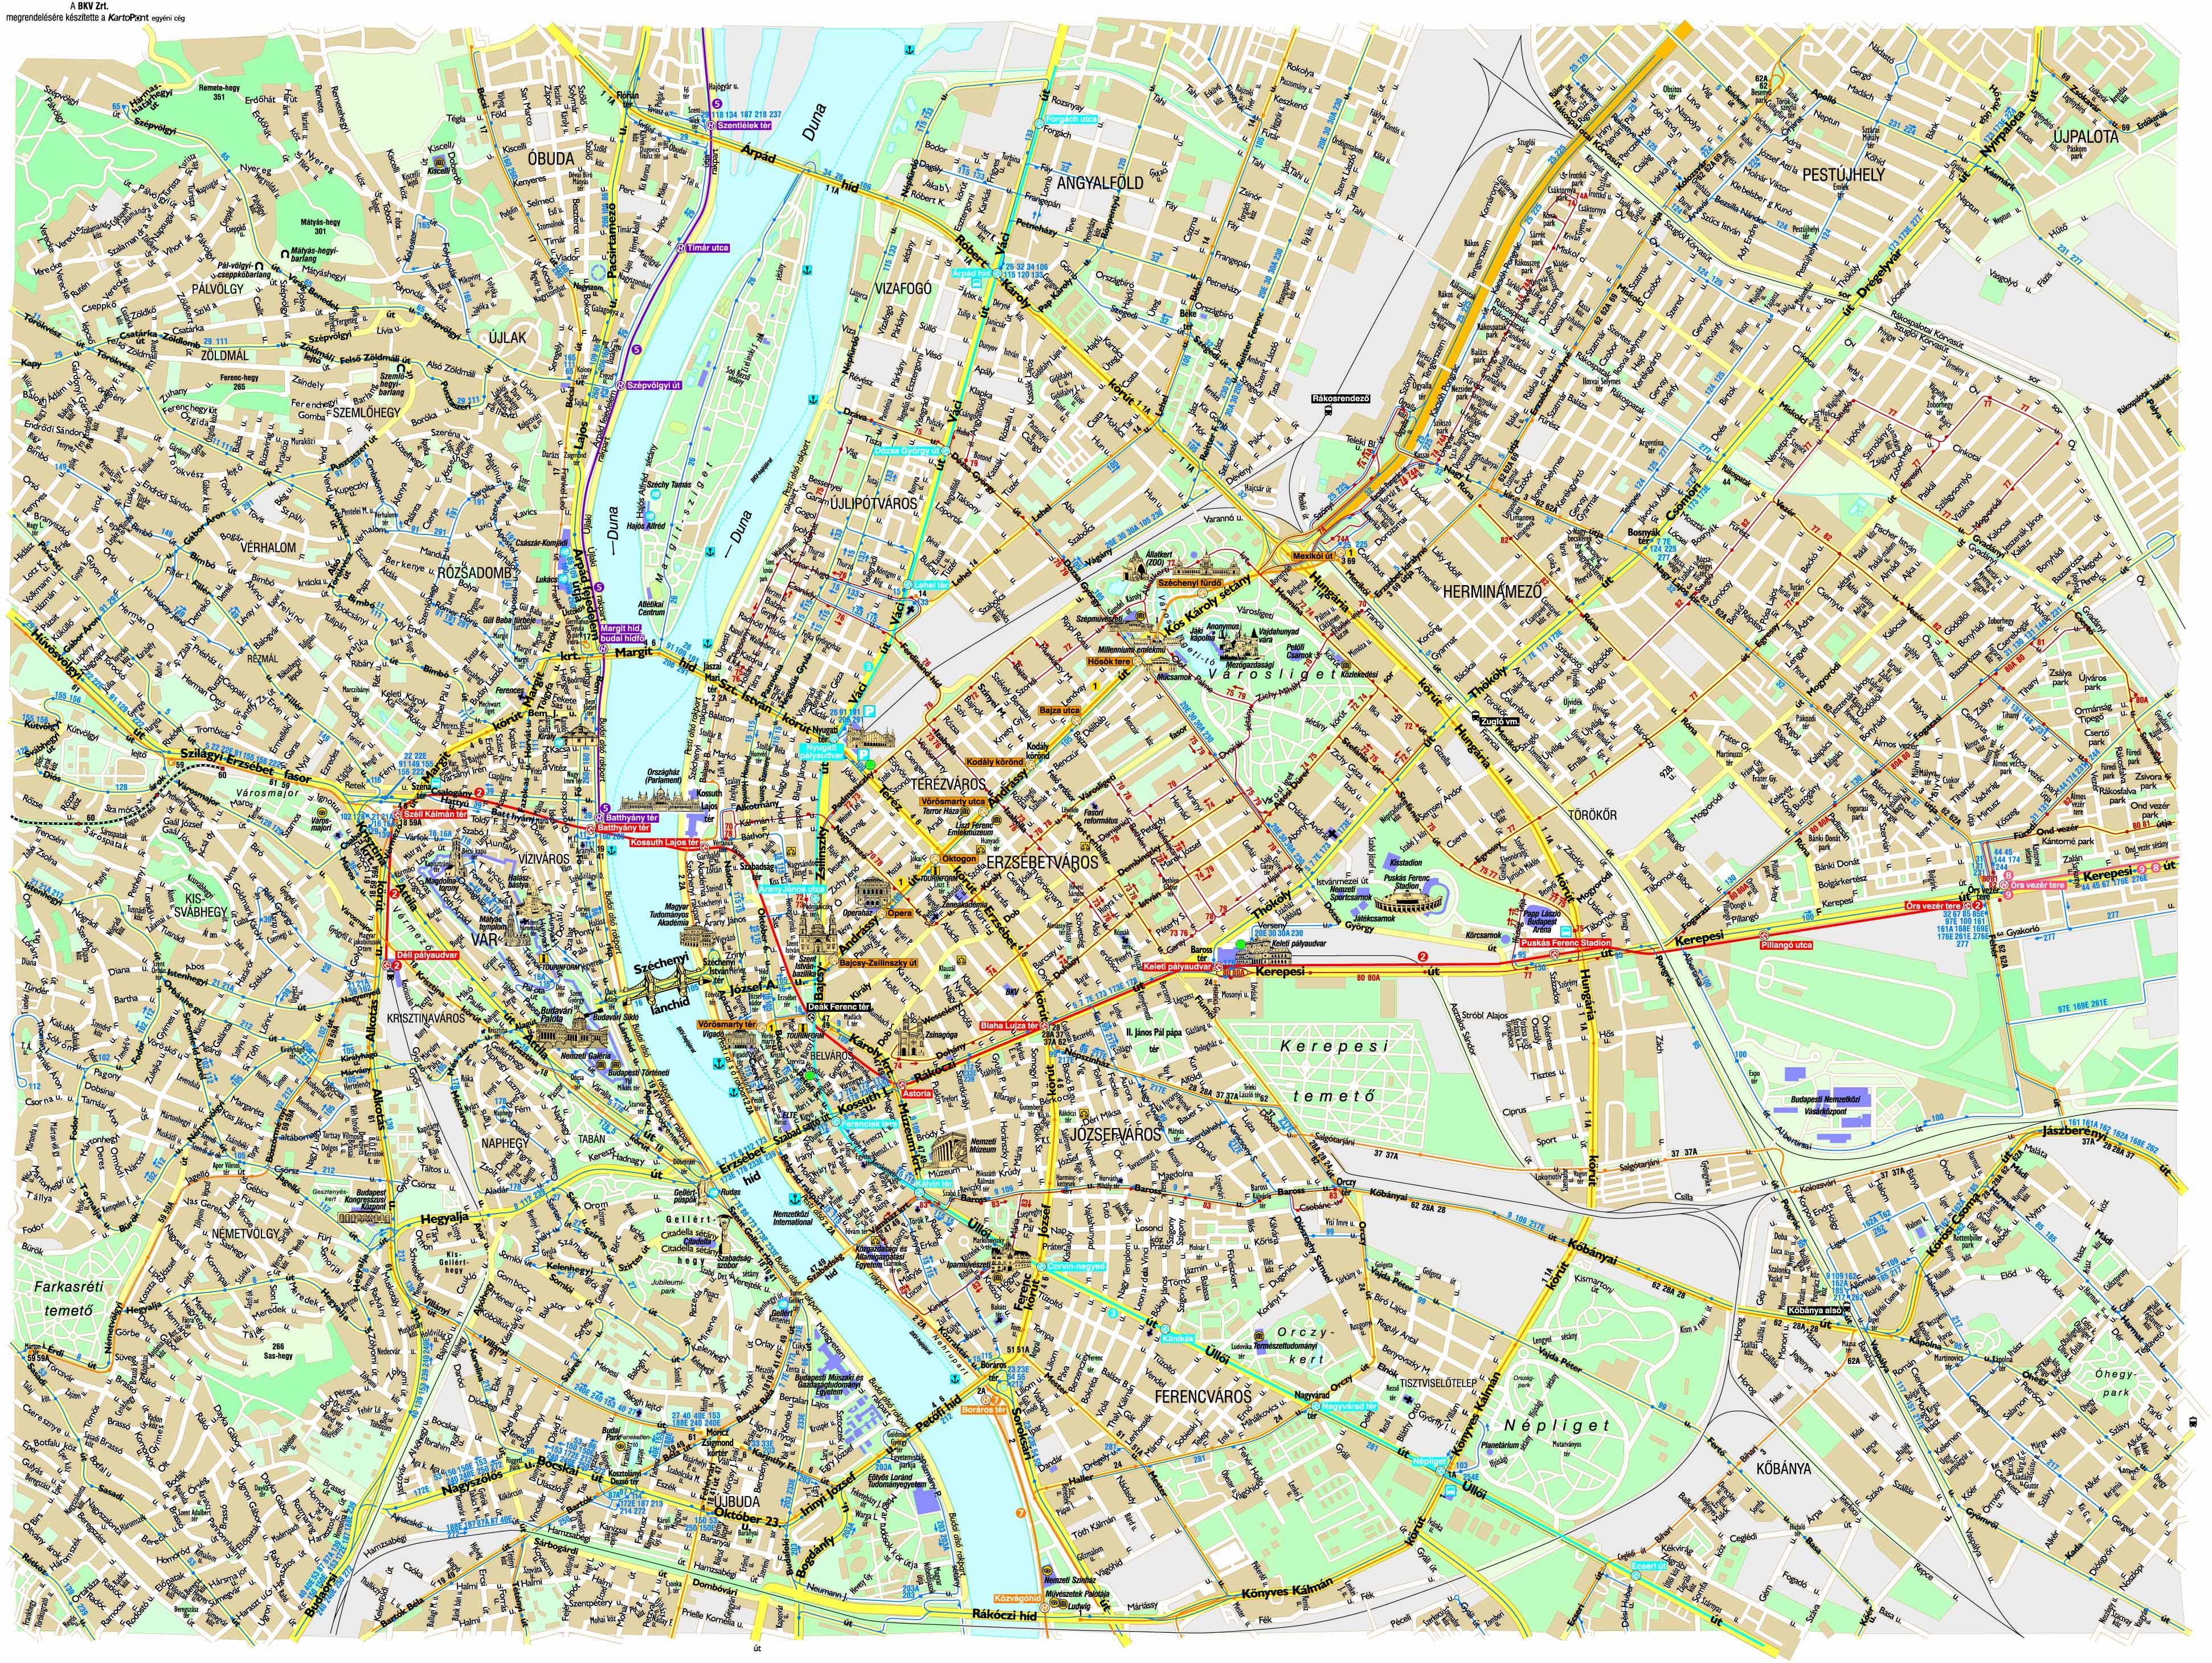 Mapa Turistico Budapest Pdf.Preparando El Viaje A Budapest Mapa Y Mochila